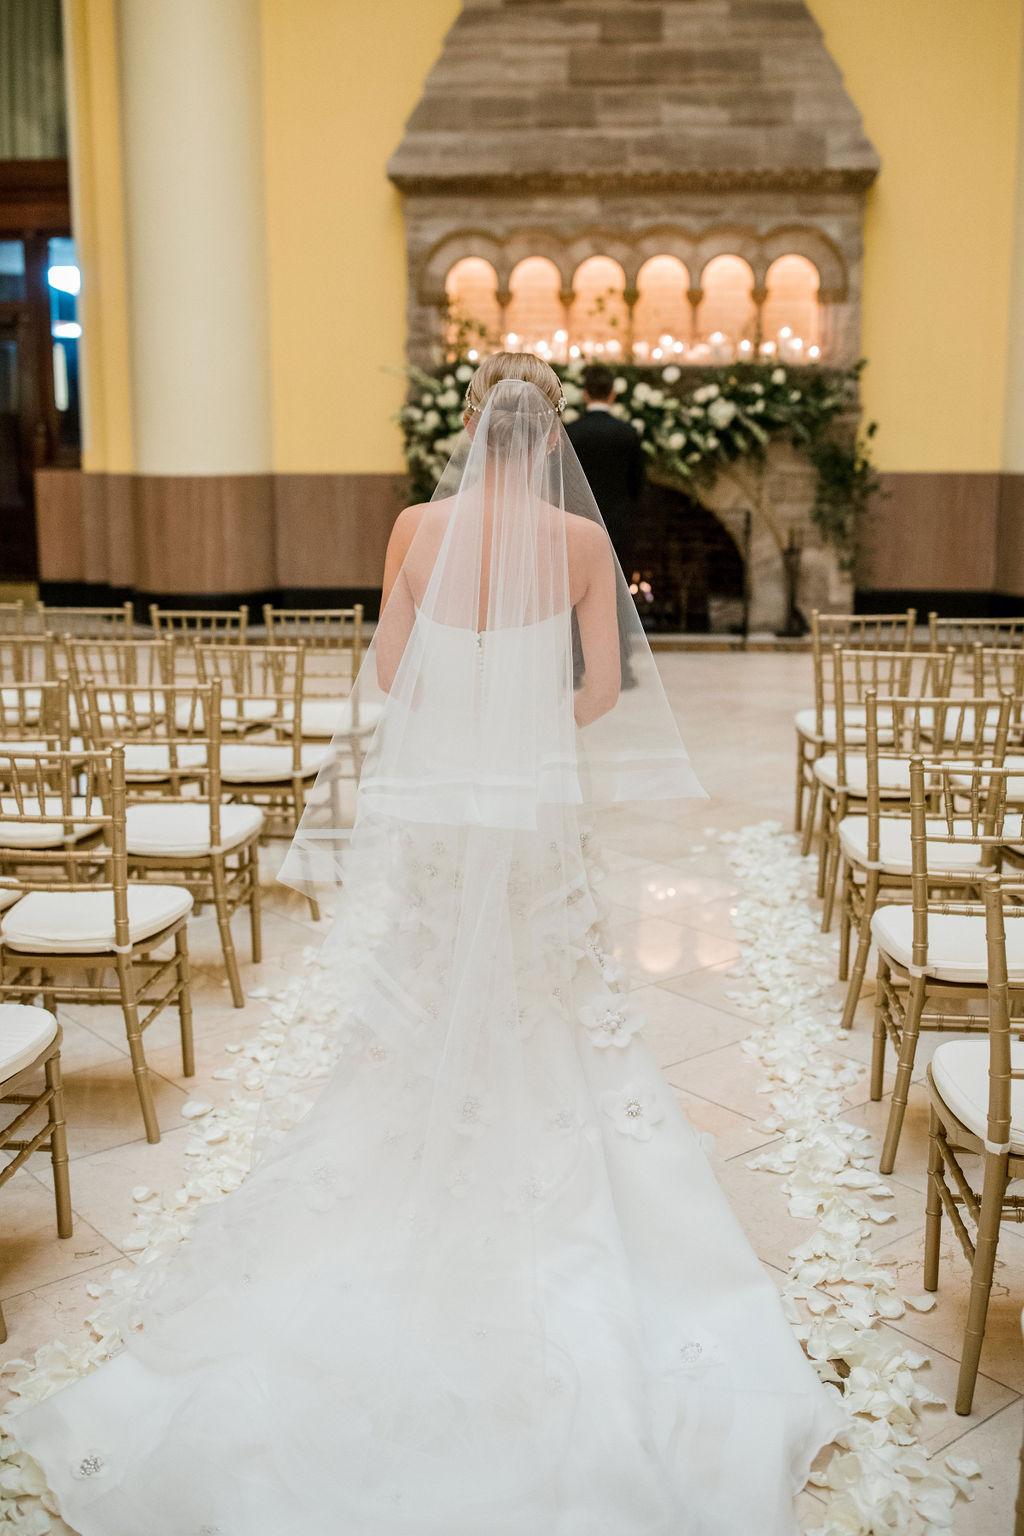 Wedding first look: Lavish Union Station Hotel Wedding featured on Nashville Bride Guide